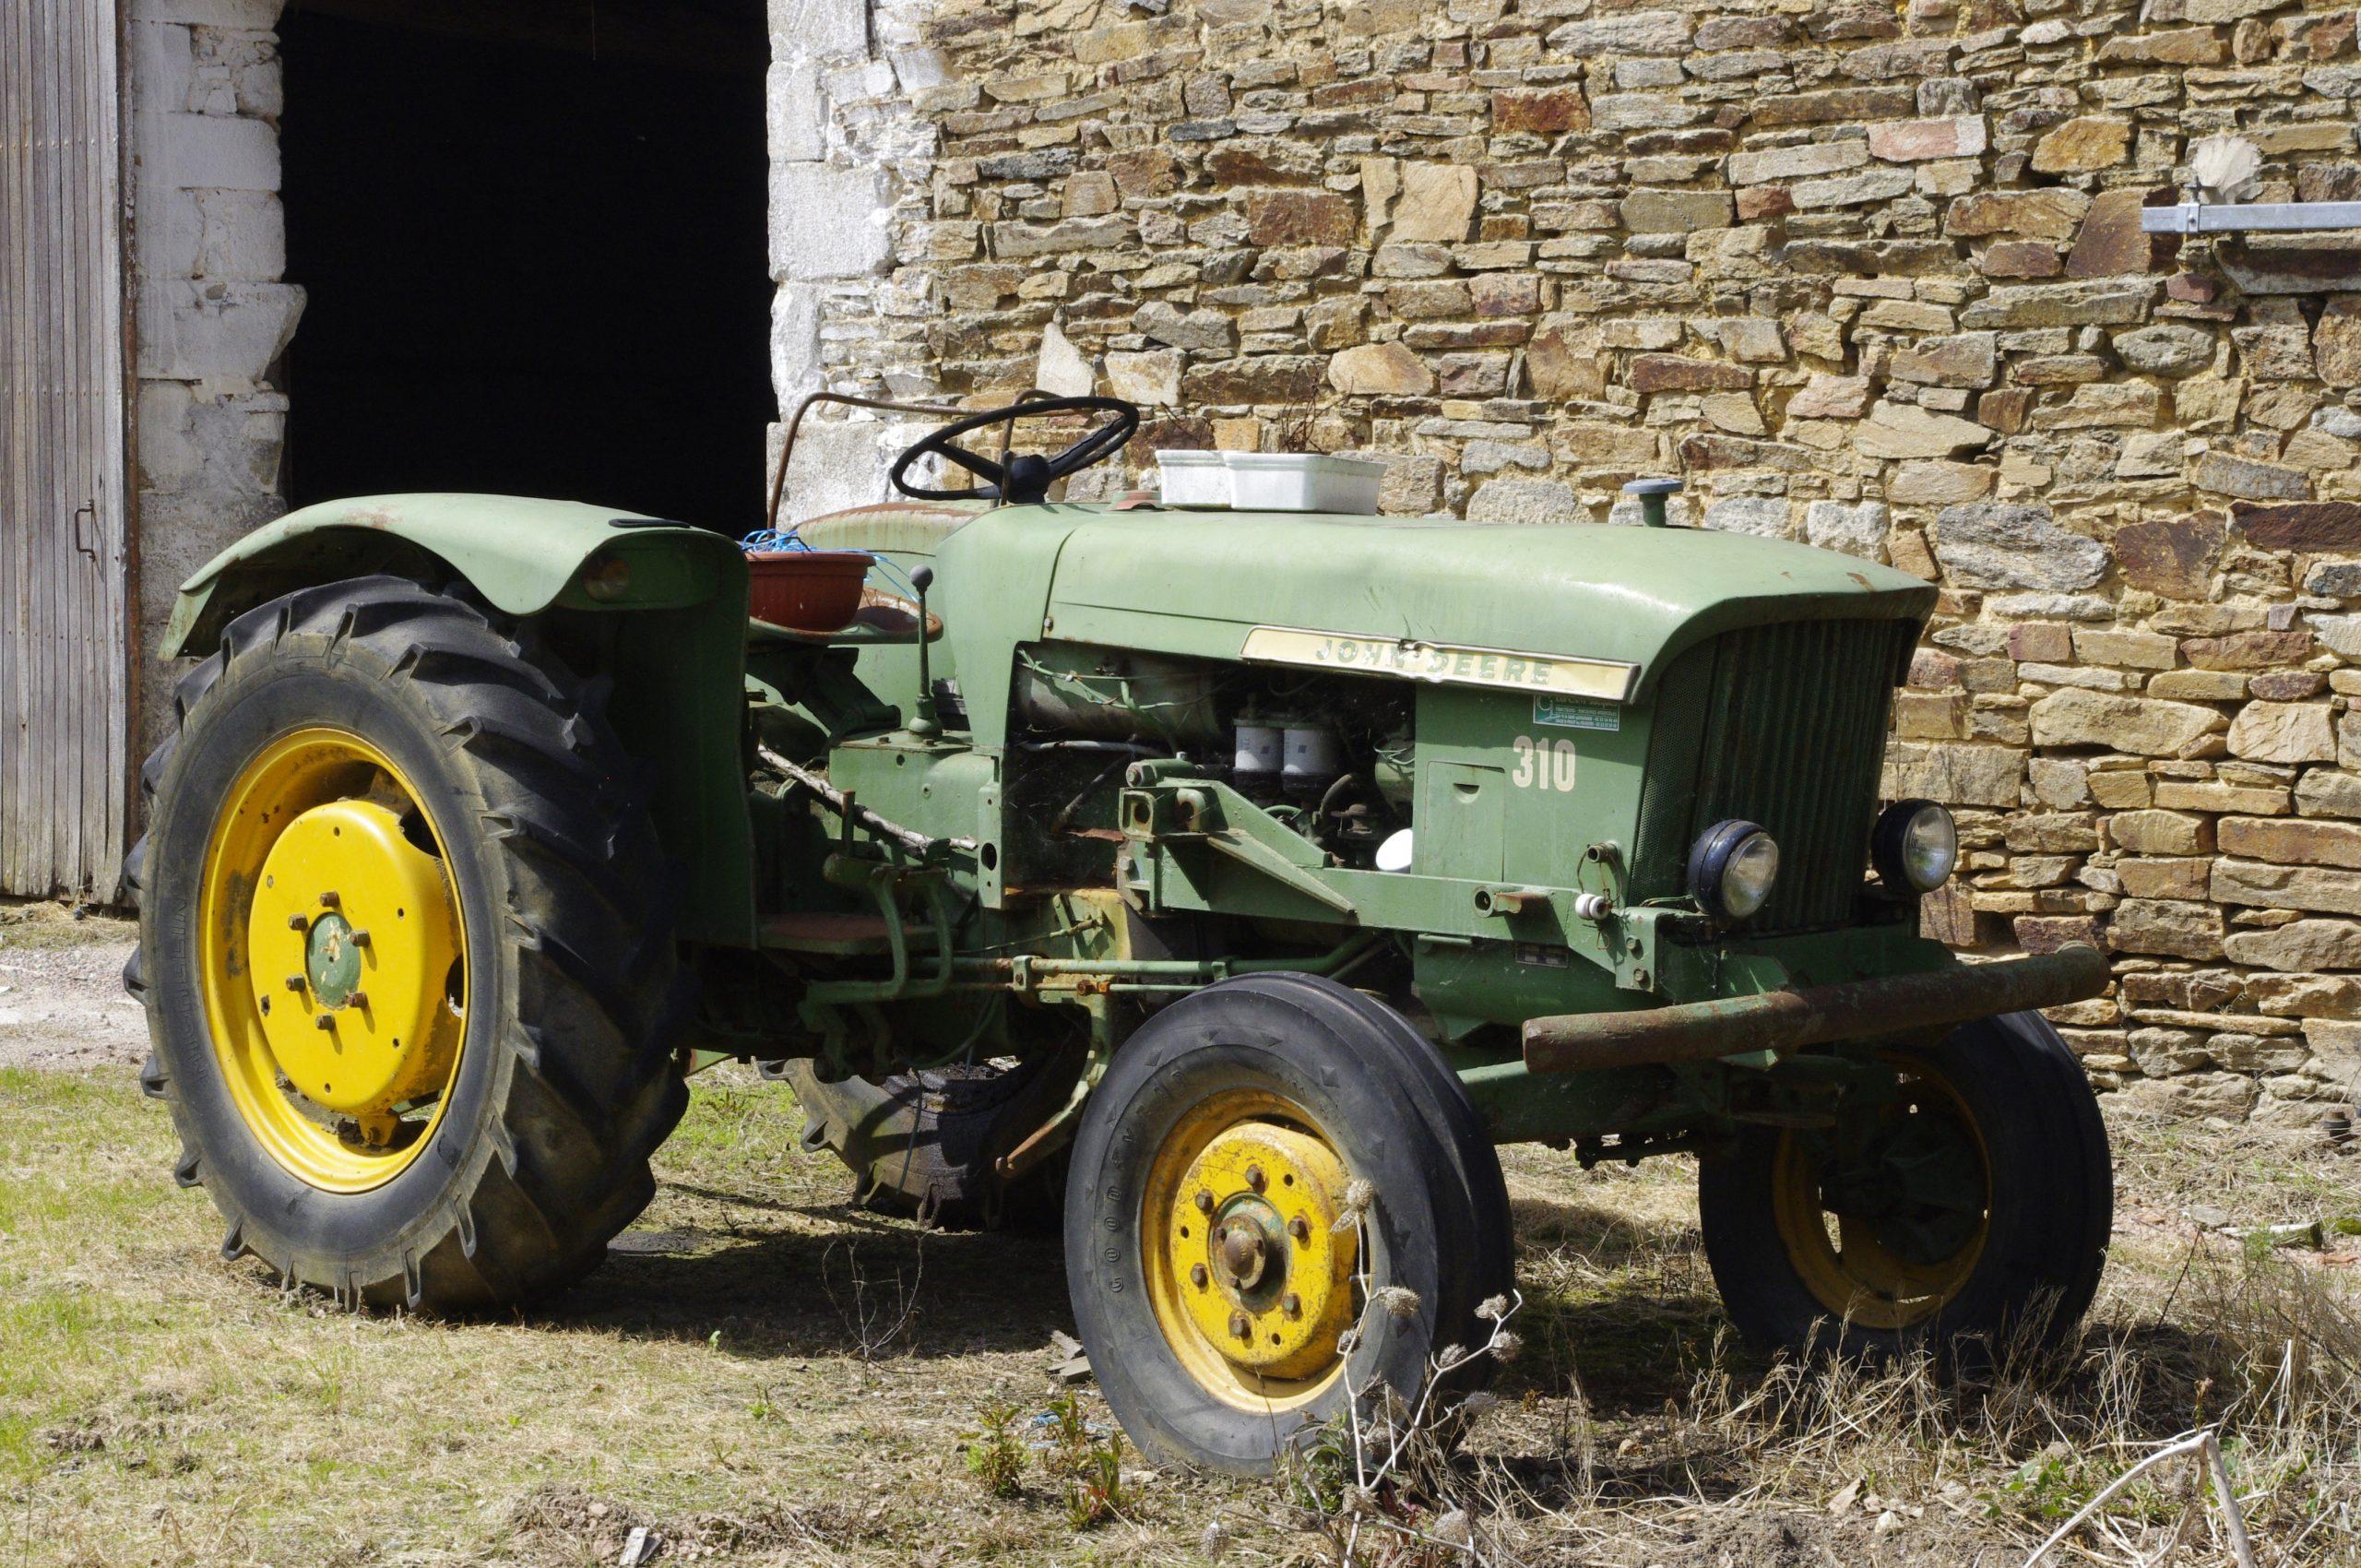 File:tracteur-John-Deere-310 01 - Wikimedia Commons concernant Image Tracteur John Deere